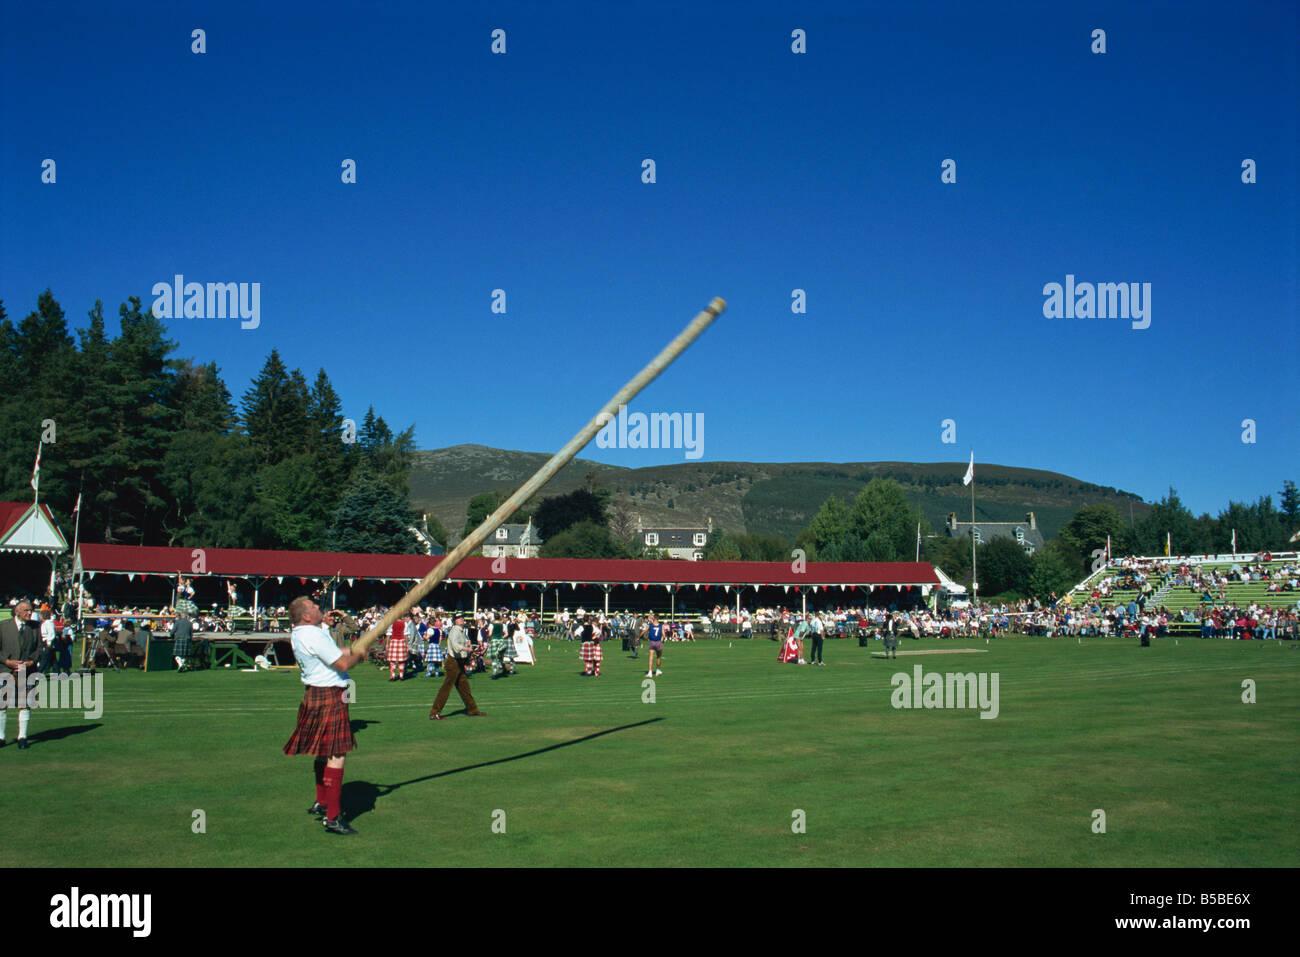 Royal Highland Games, Braemar, Grampian, Scotland, Europe - Stock Image